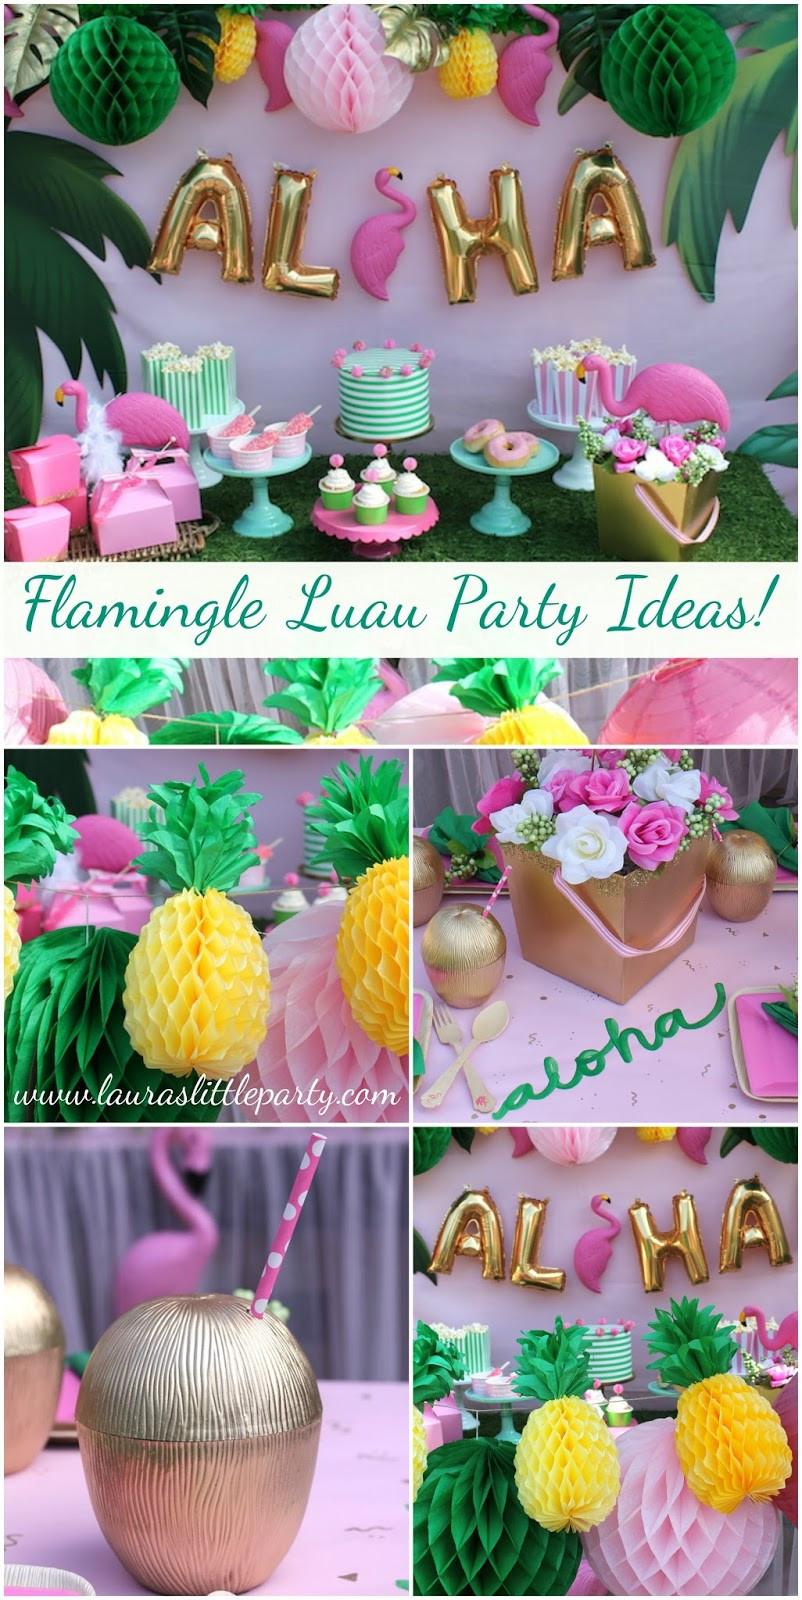 Summer Theme Party Ideas  Let s Flamingle Luau Summer Party Ideas LAURA S little